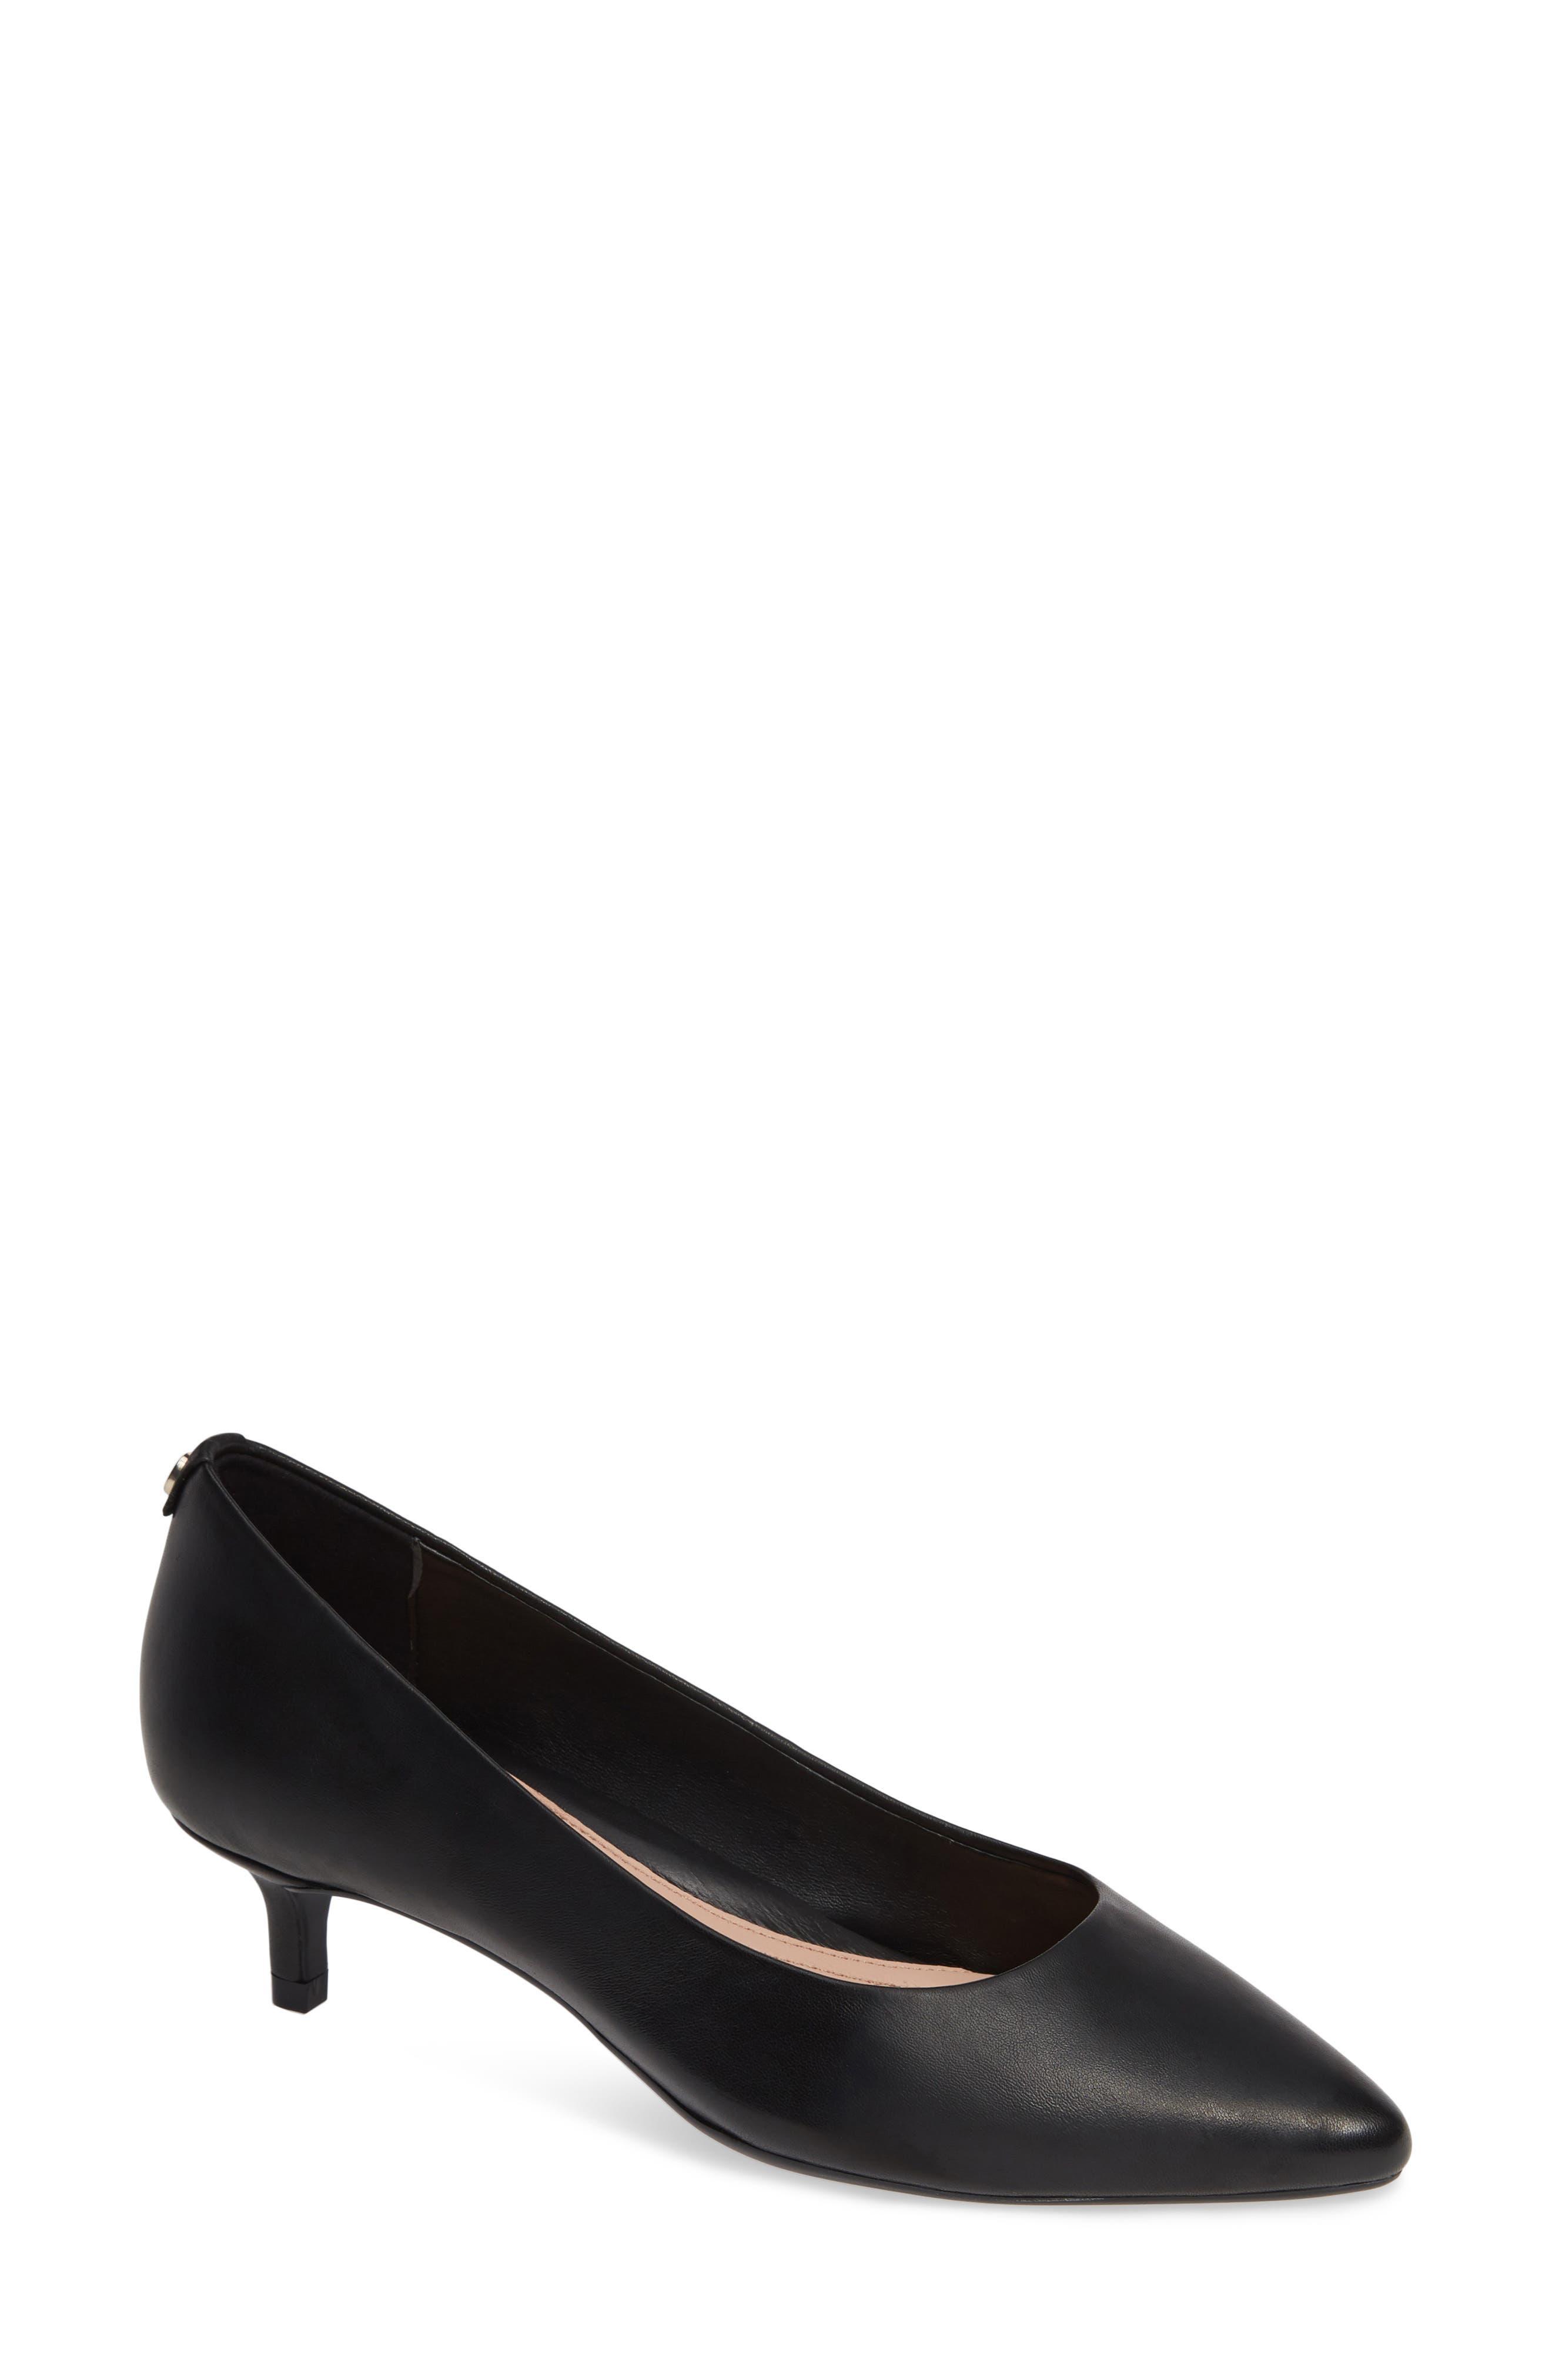 TARYN ROSE Naomi Leather Kitten-Heel Pumps in Black Leather